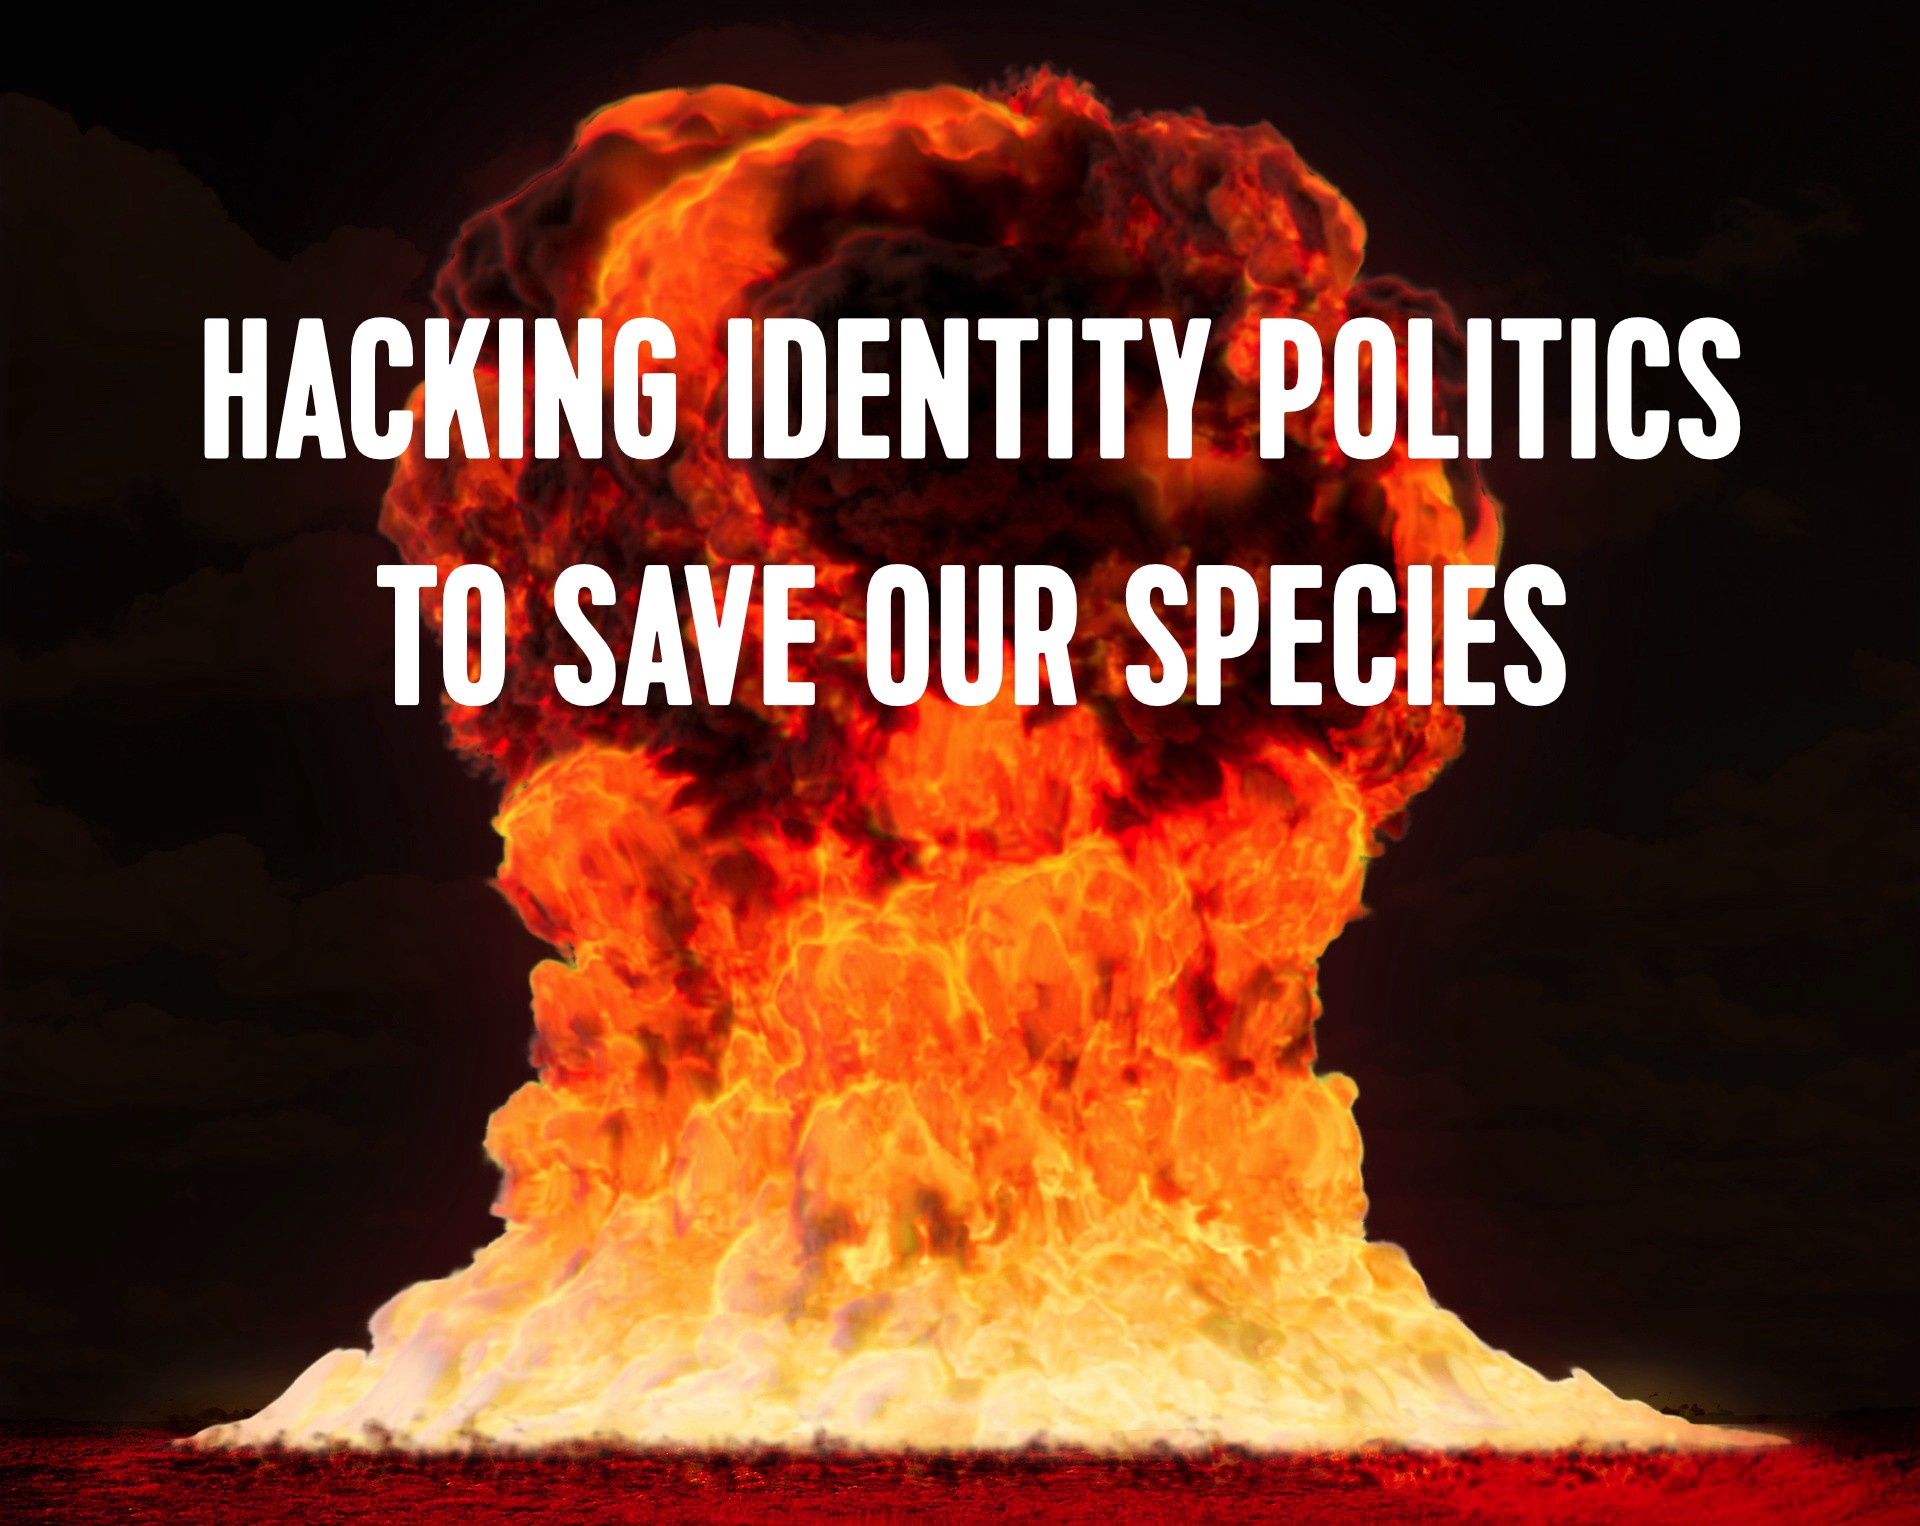 /hacking-identity-politics-877205e1f310 feature image